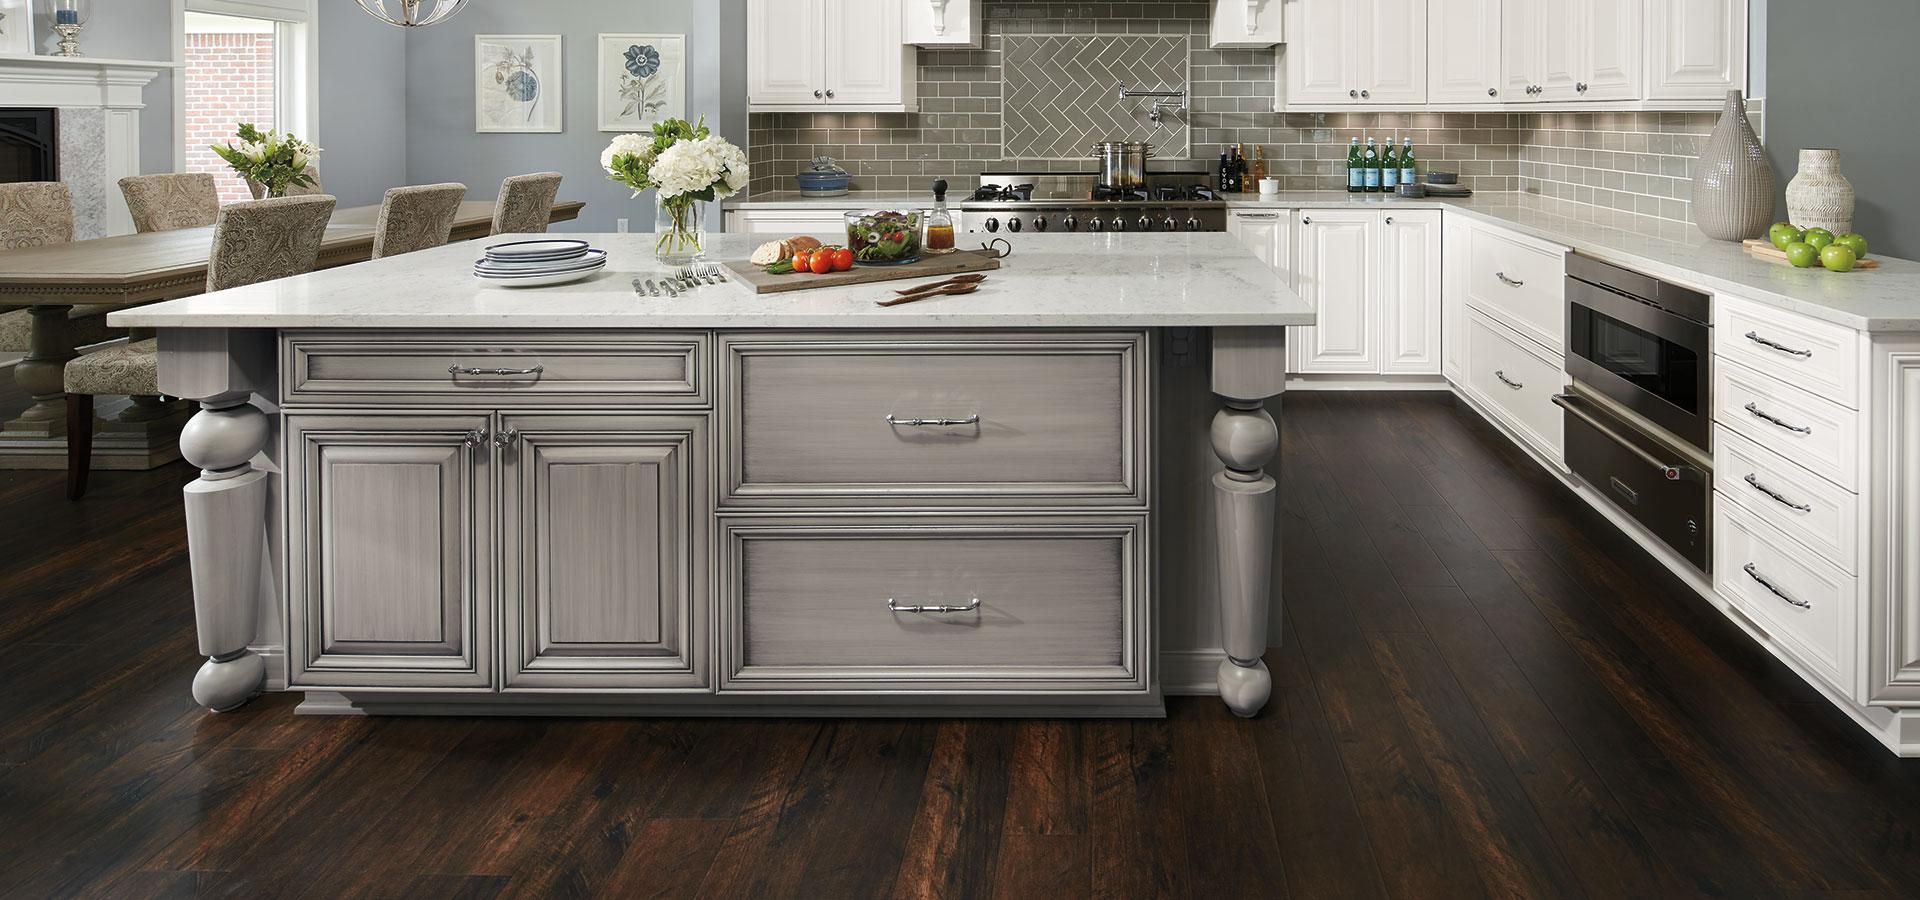 ArtesiMWiMDovEbBrsh & Custom Cabinets u2013 Bathroom u0026 Kitchen Cabinetry u2013 Omega